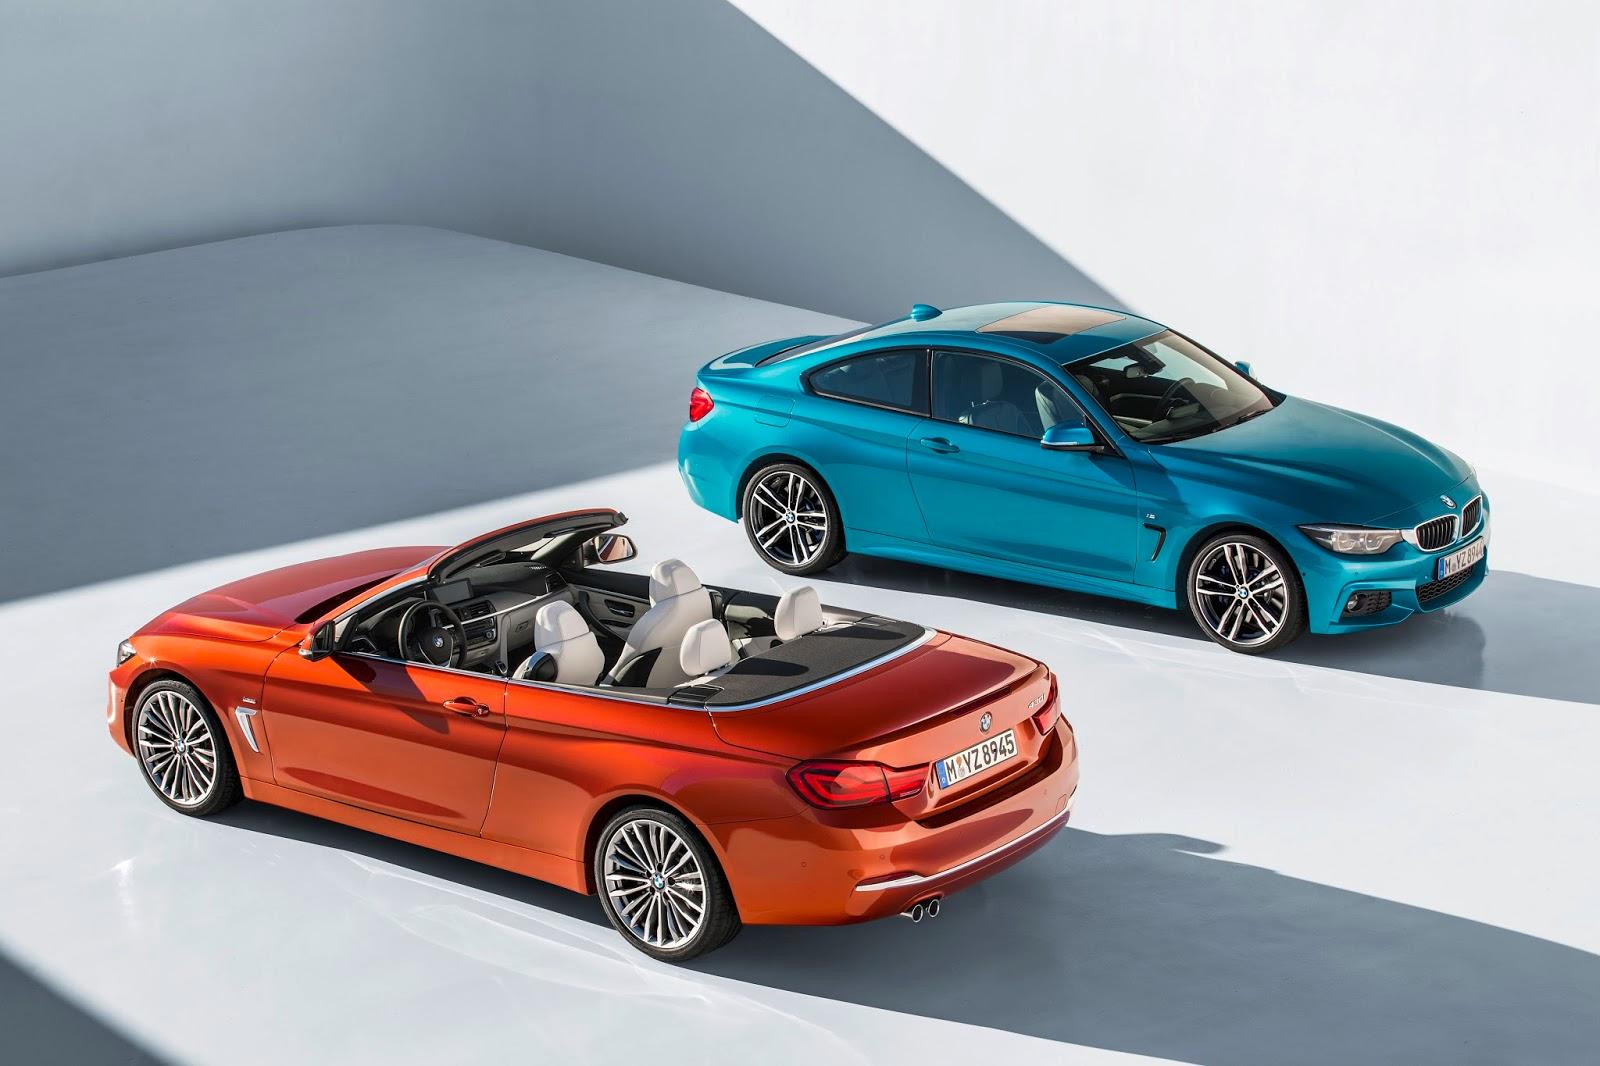 P90245198 highRes the new bmw 4 series Η νέα BMW Σειρά 4, με πιο σφιχτή ρύθμιση ανάρτησης BMW, Bmw 4, BMW 4 Cabrio, BMW 4 Coupe, BMW 4 Gran Coupé, Facelift